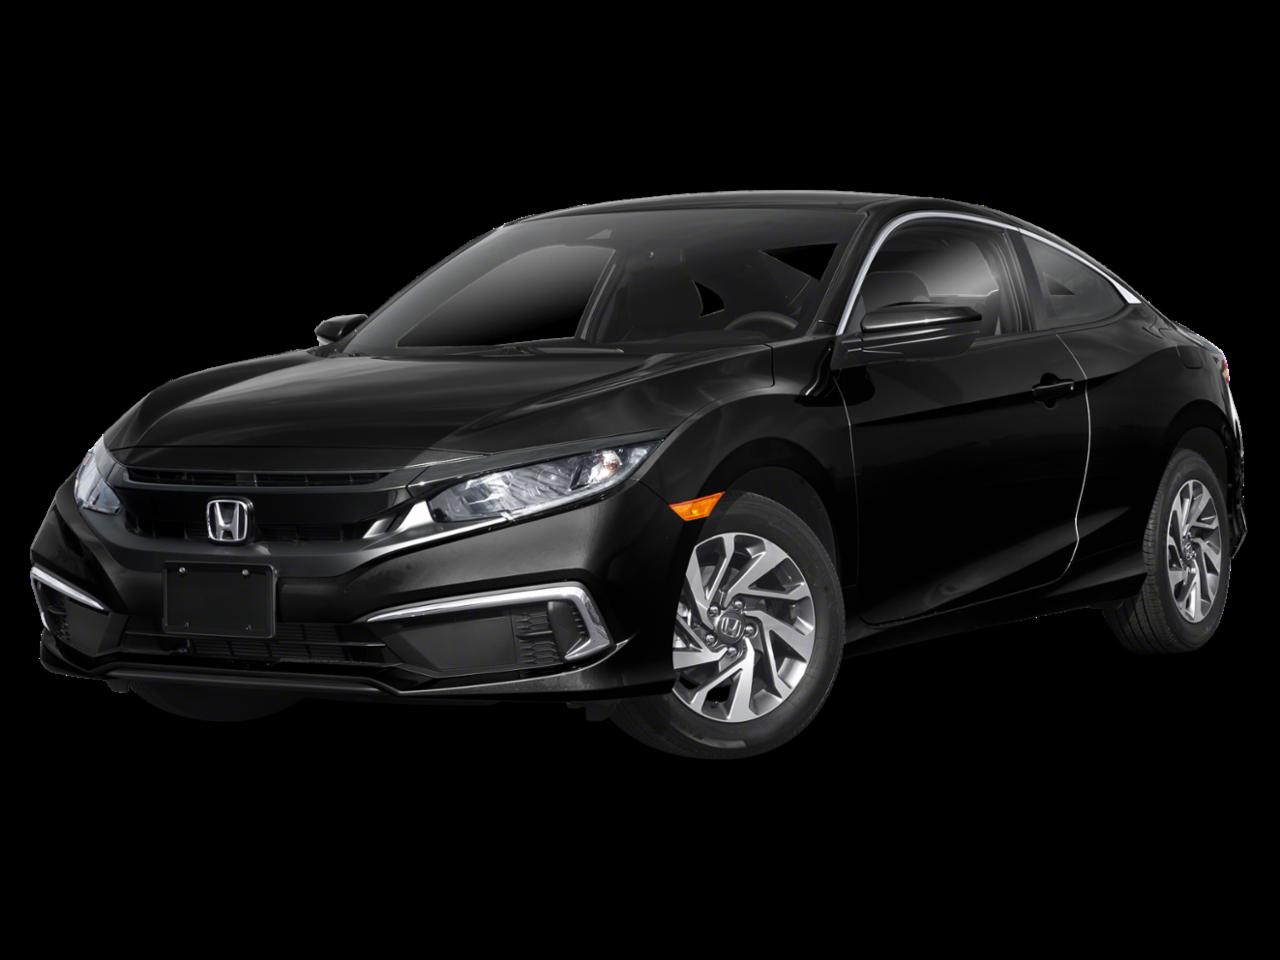 Honda 2020 Civic Coupe LX